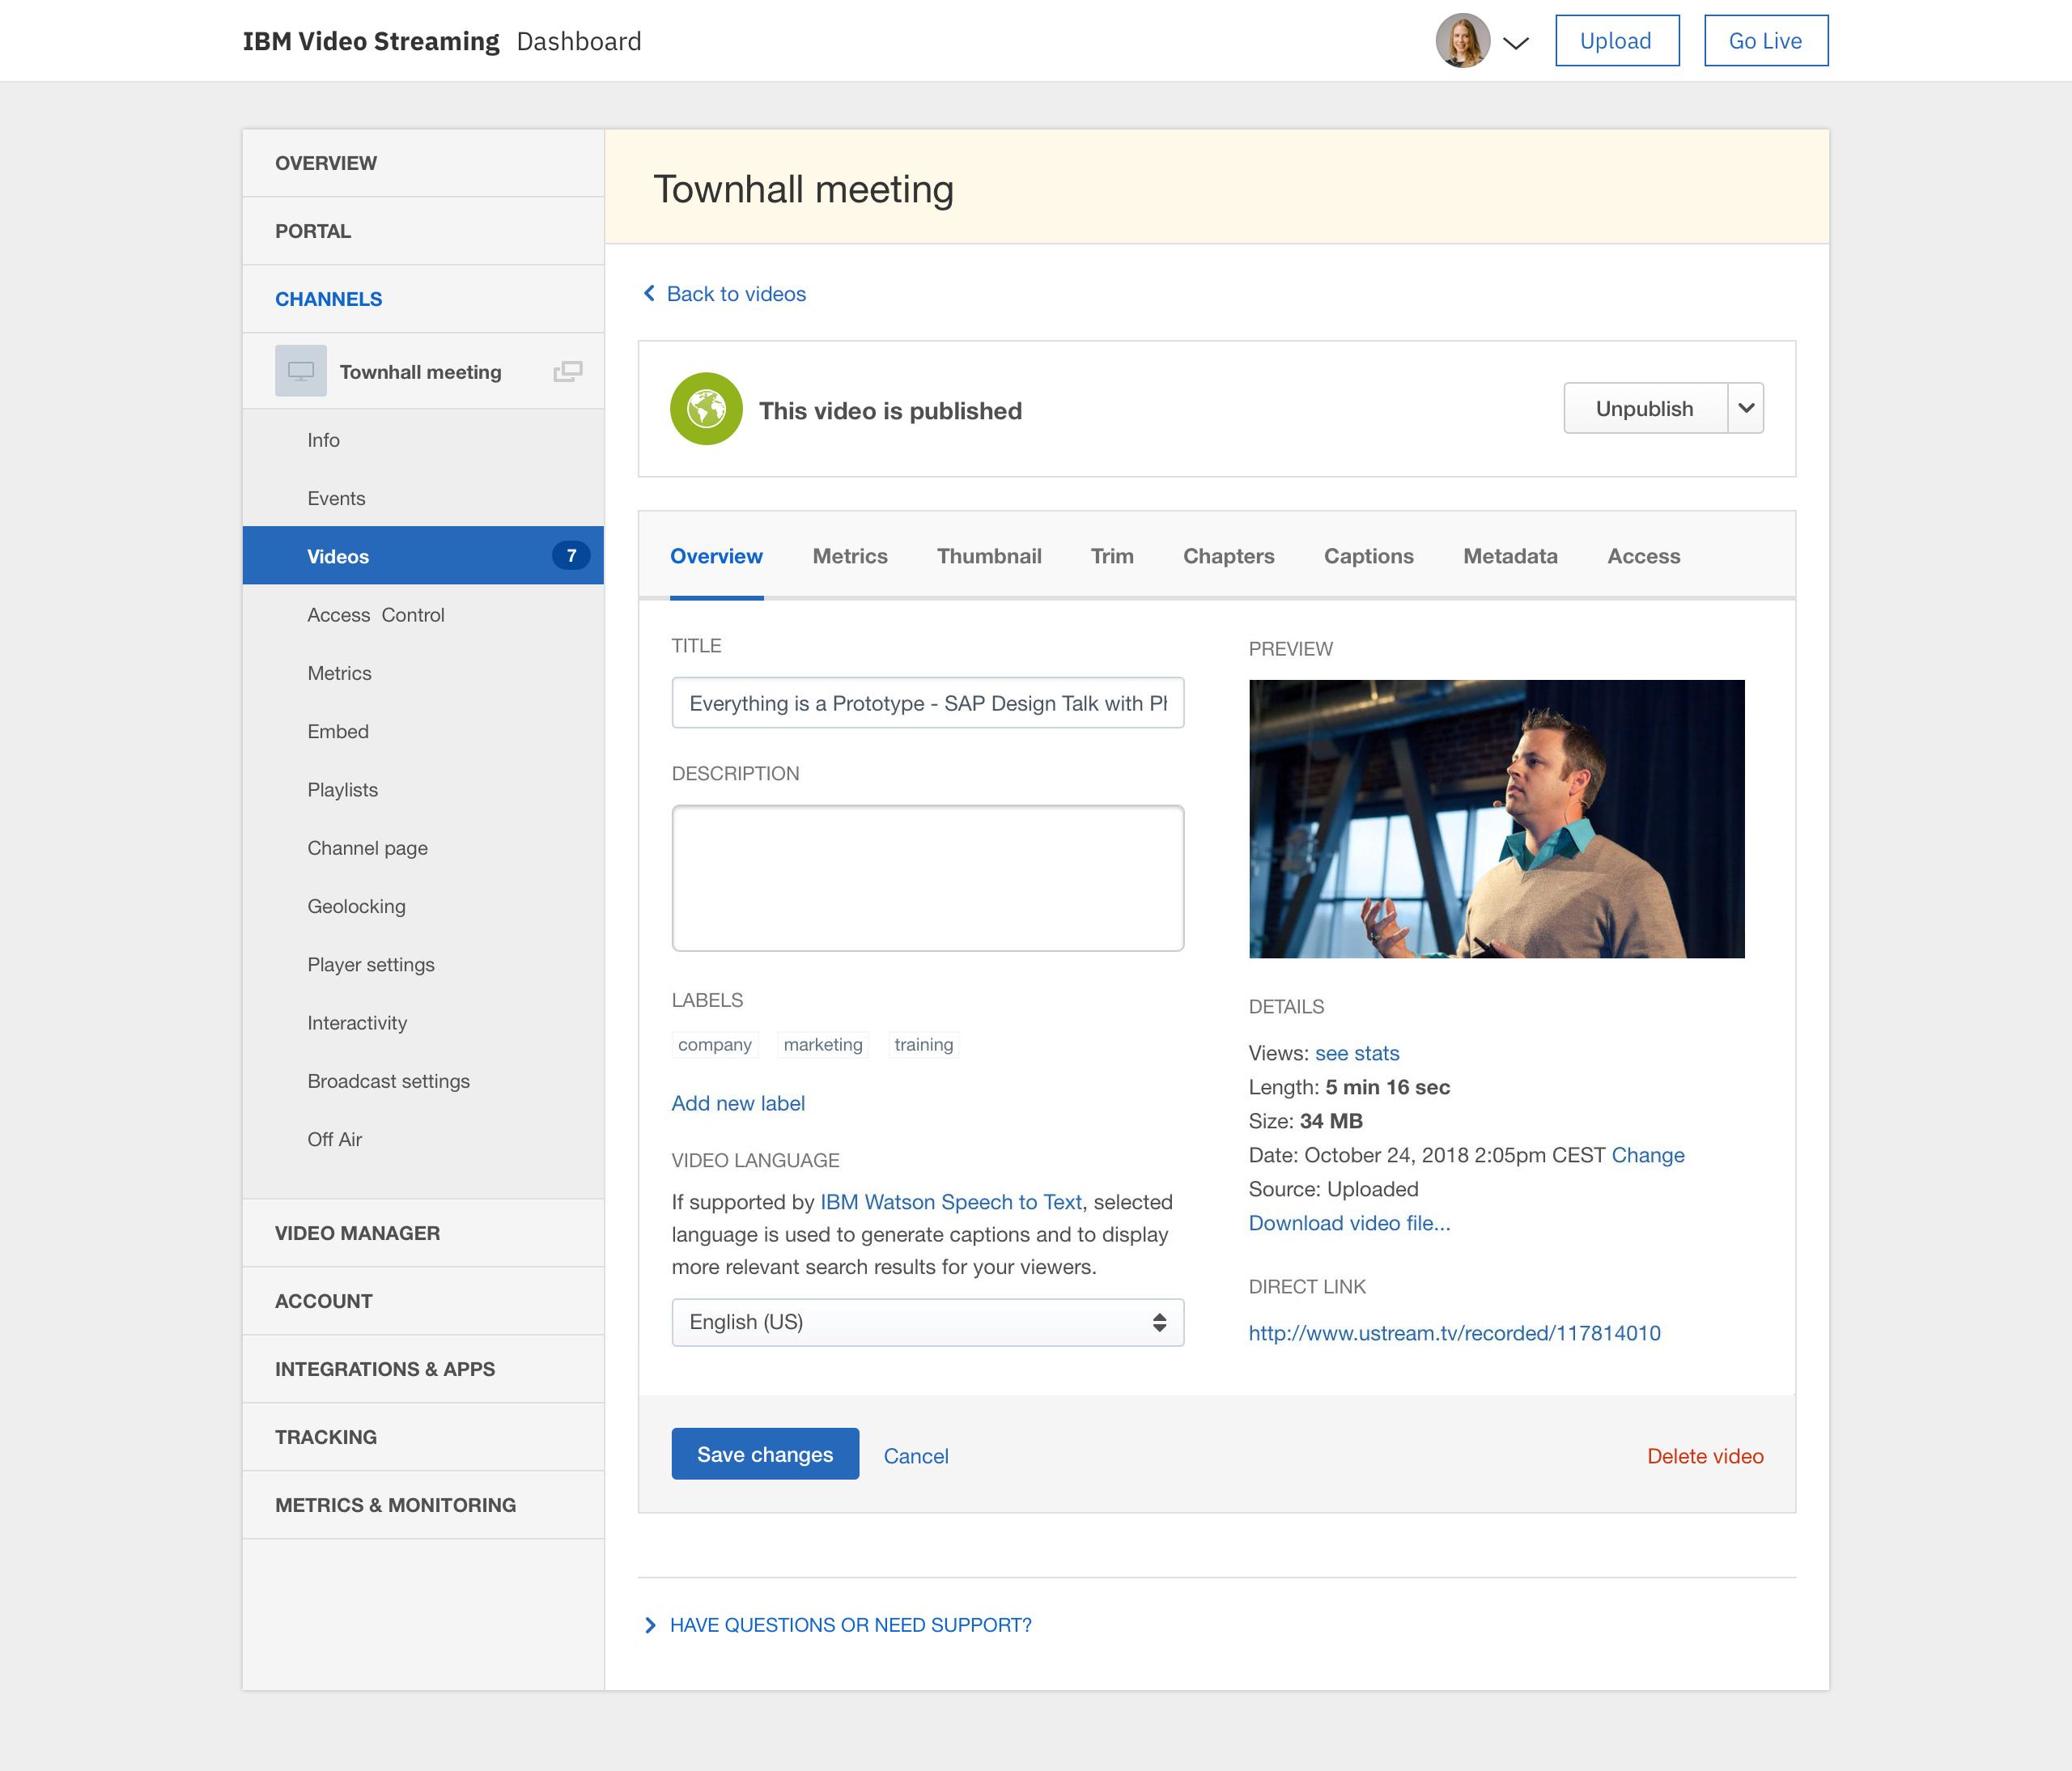 IBM Enterprise Video Streaming Reviews 2019: Details